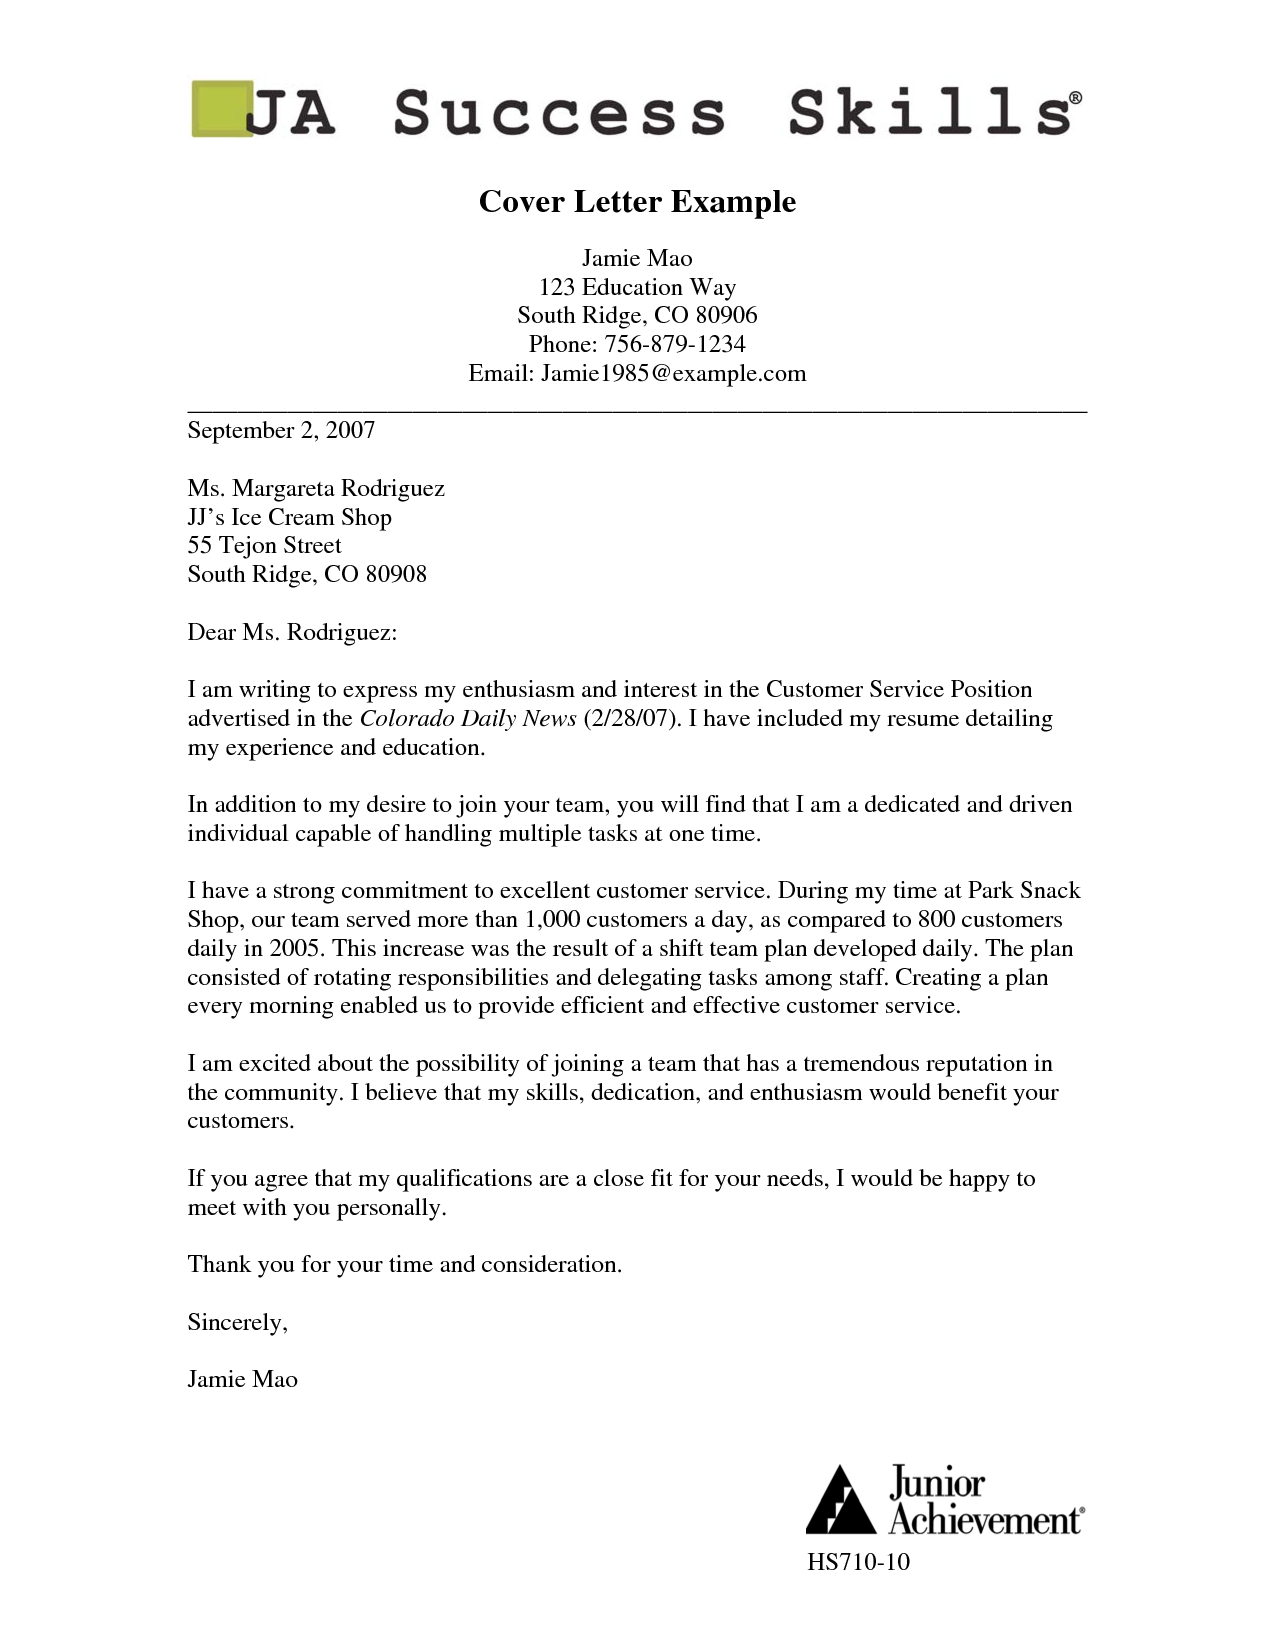 job cover letter format pdf sample application for applying basic appication - Good Cover Letter